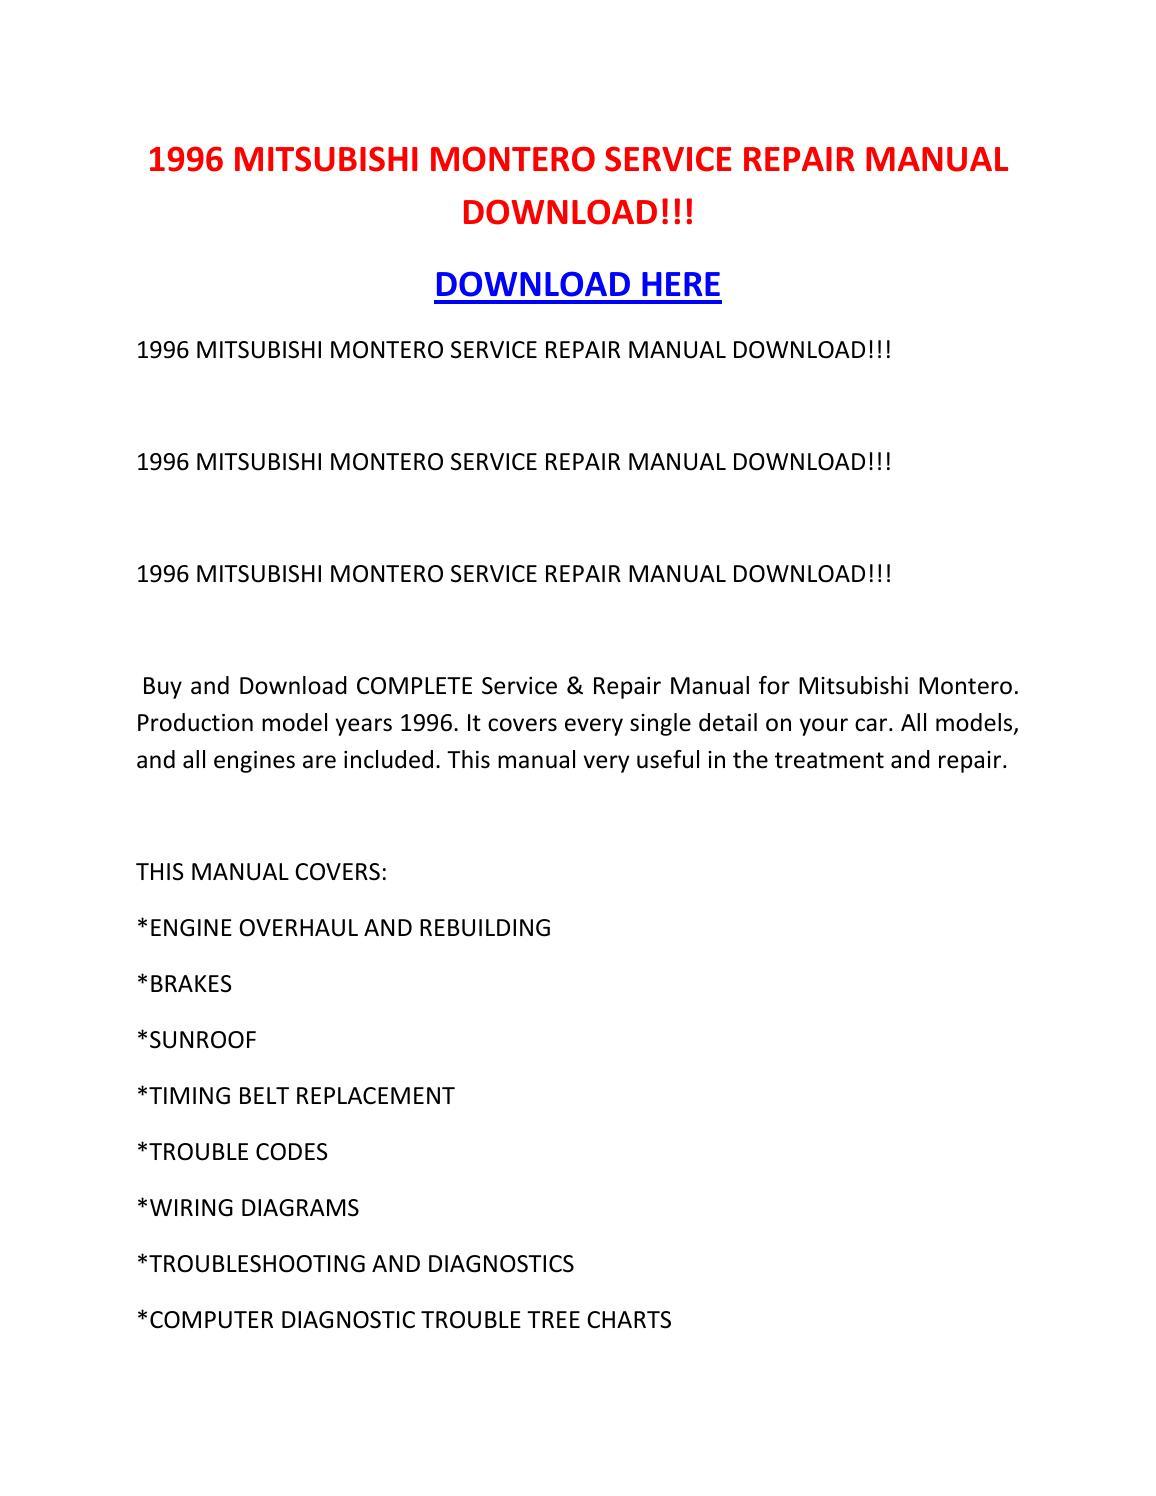 1996 Mitsubishi Montero Service Repair Manual Download